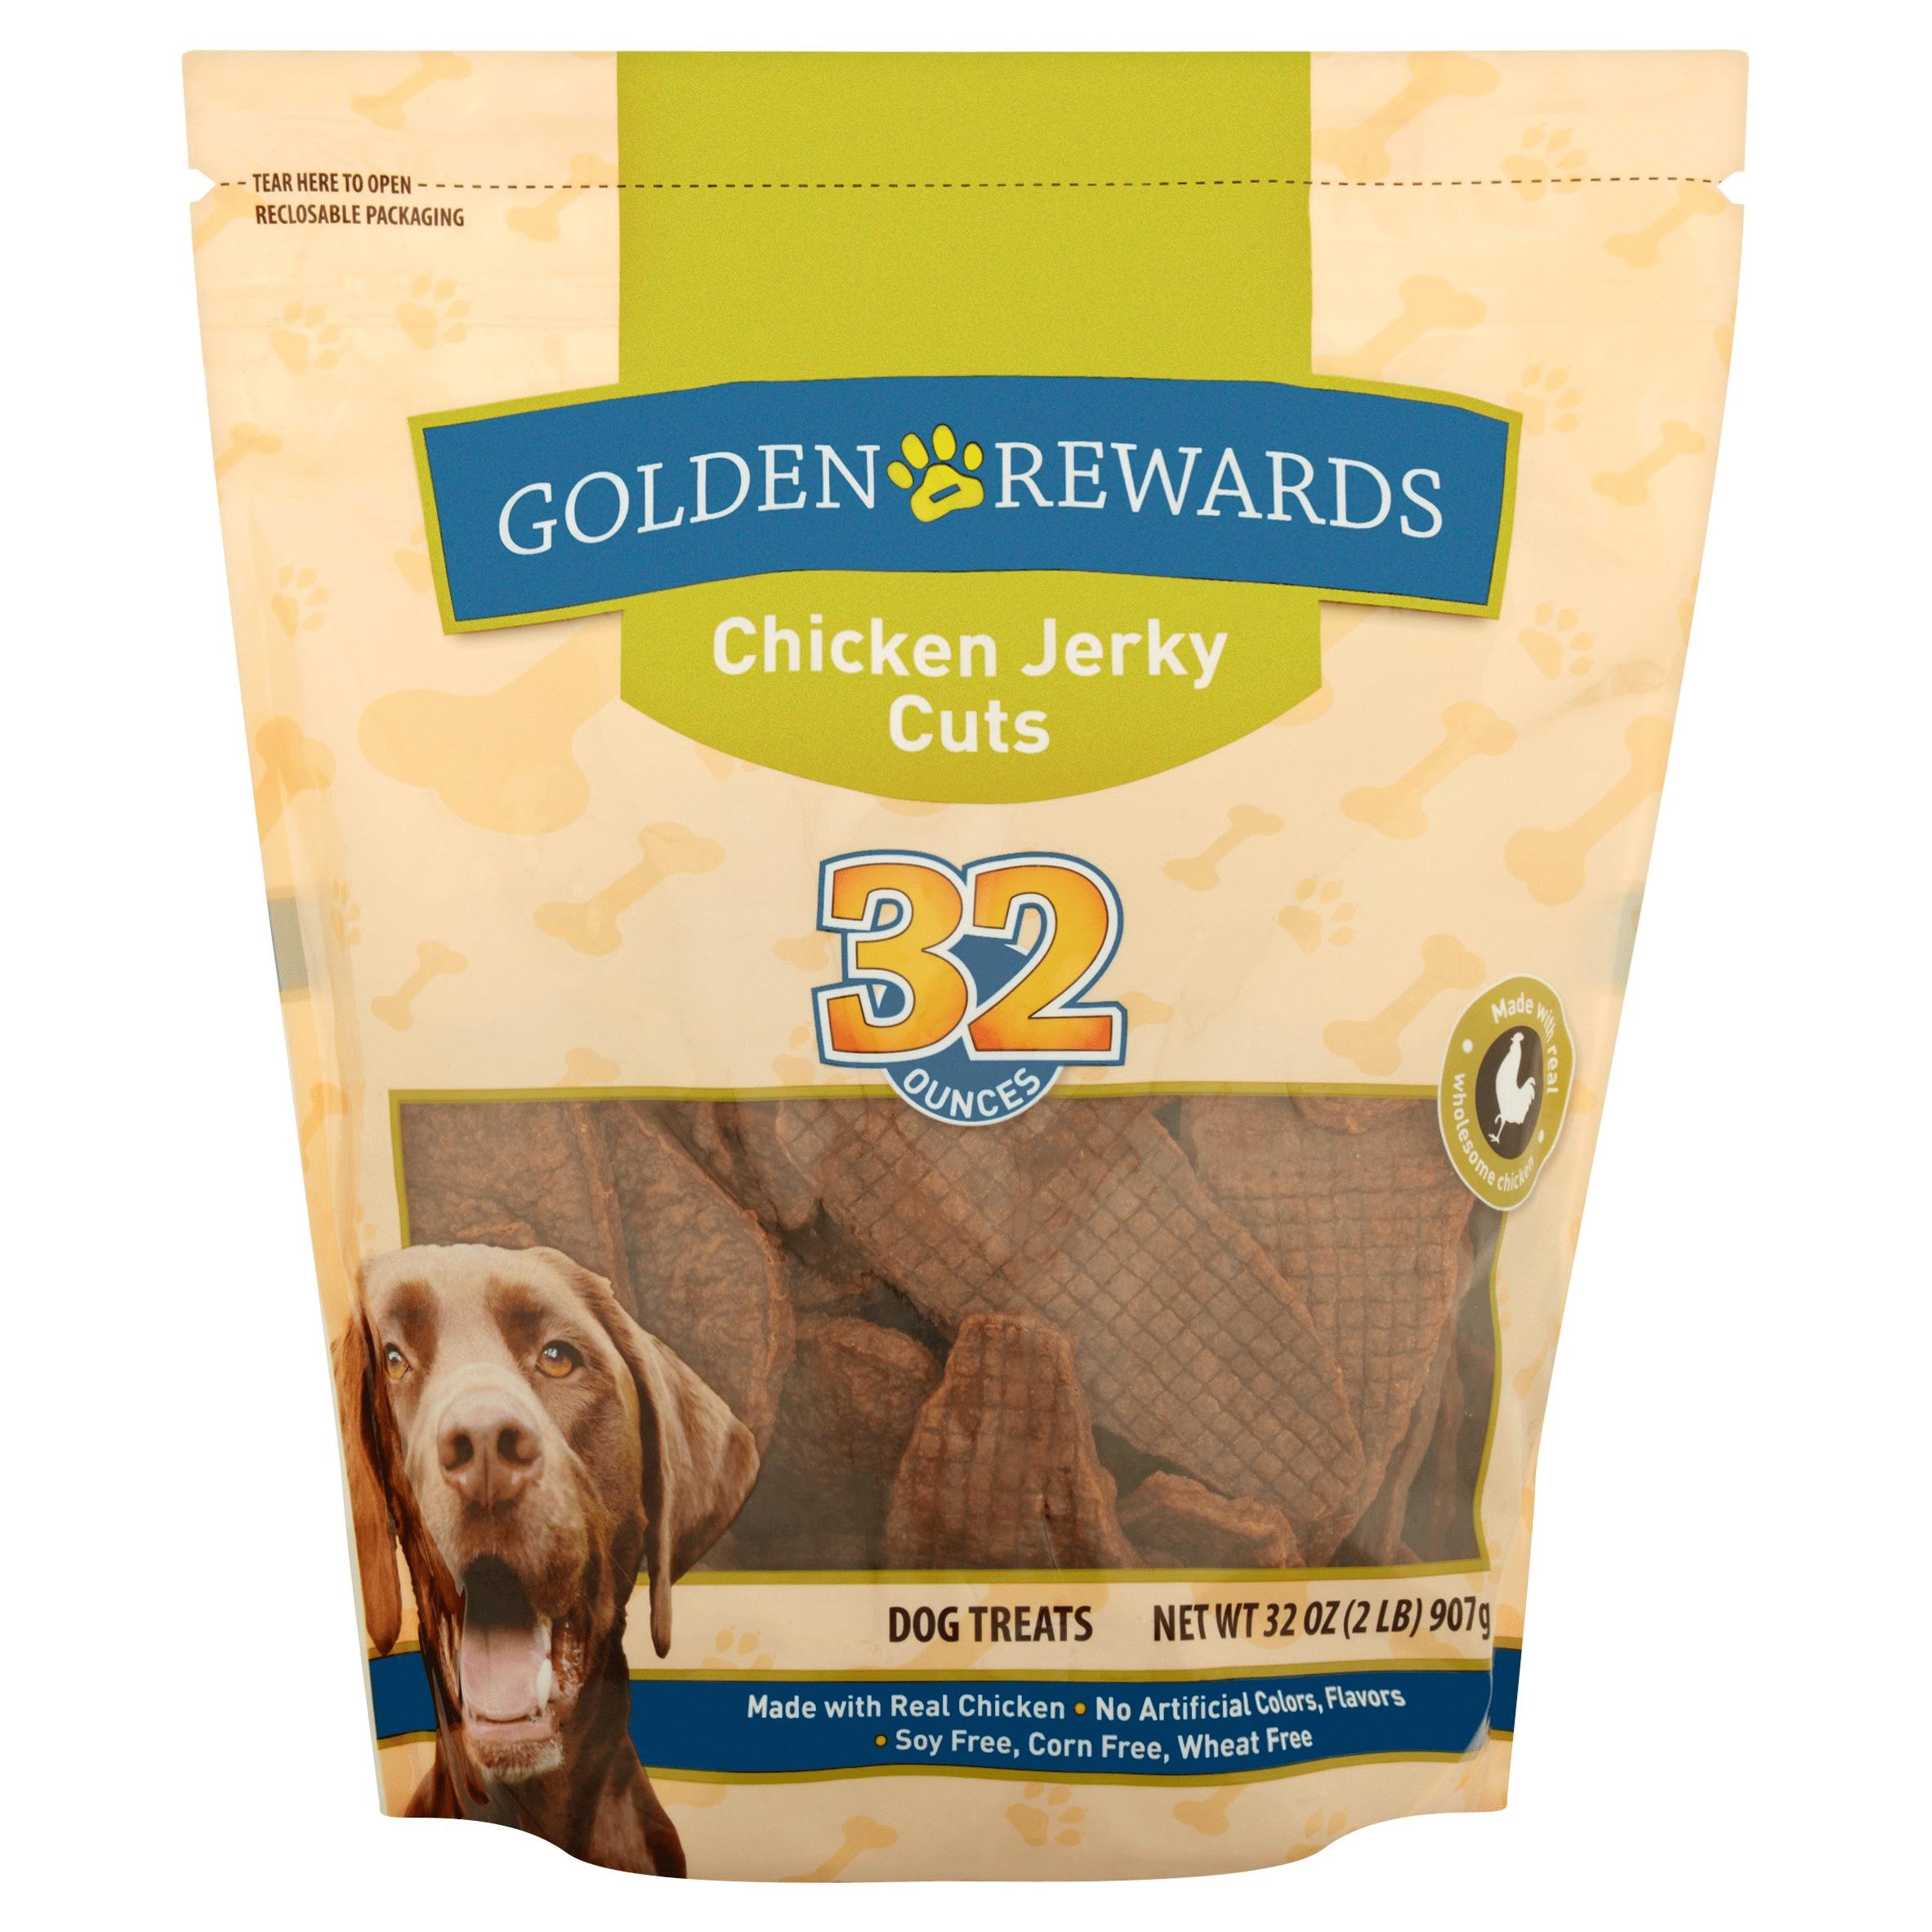 Golden Rewards Chicken Jerky Dog Treats, 32 oz. by Gambol Pet Group Co.,Ltd.